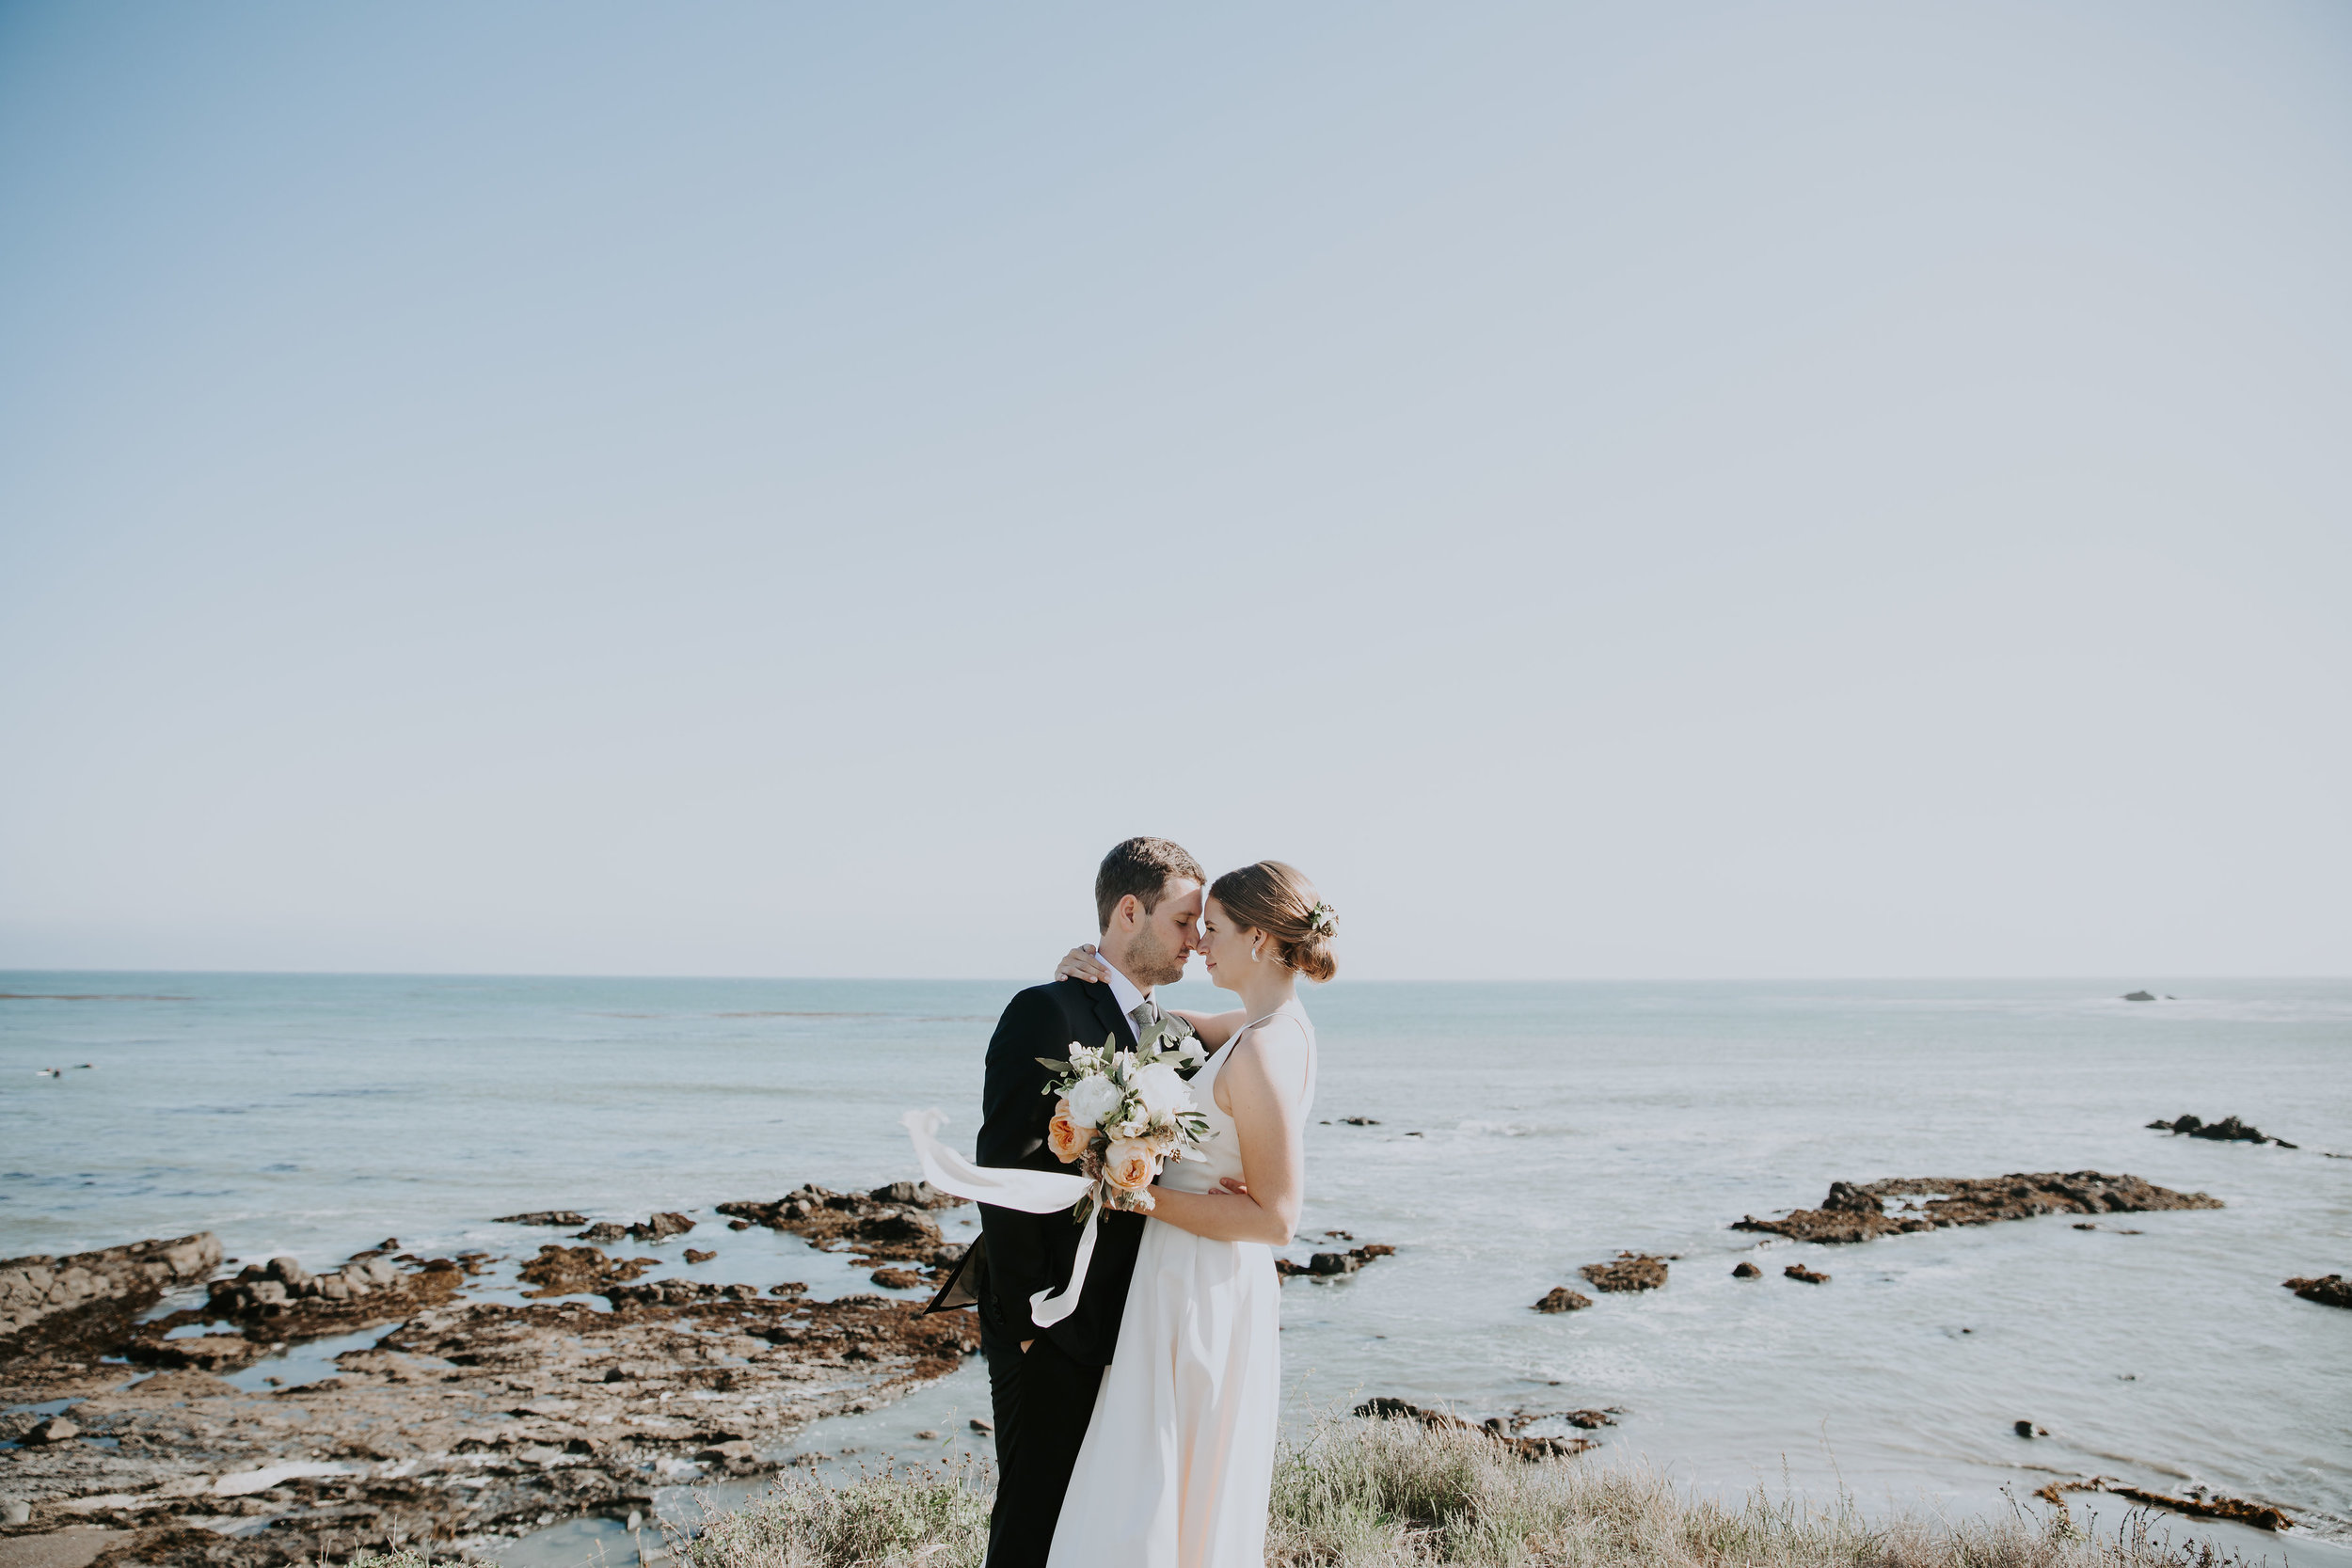 May Iosotaluno Cayucos Beach Town Wedding 38.jpg